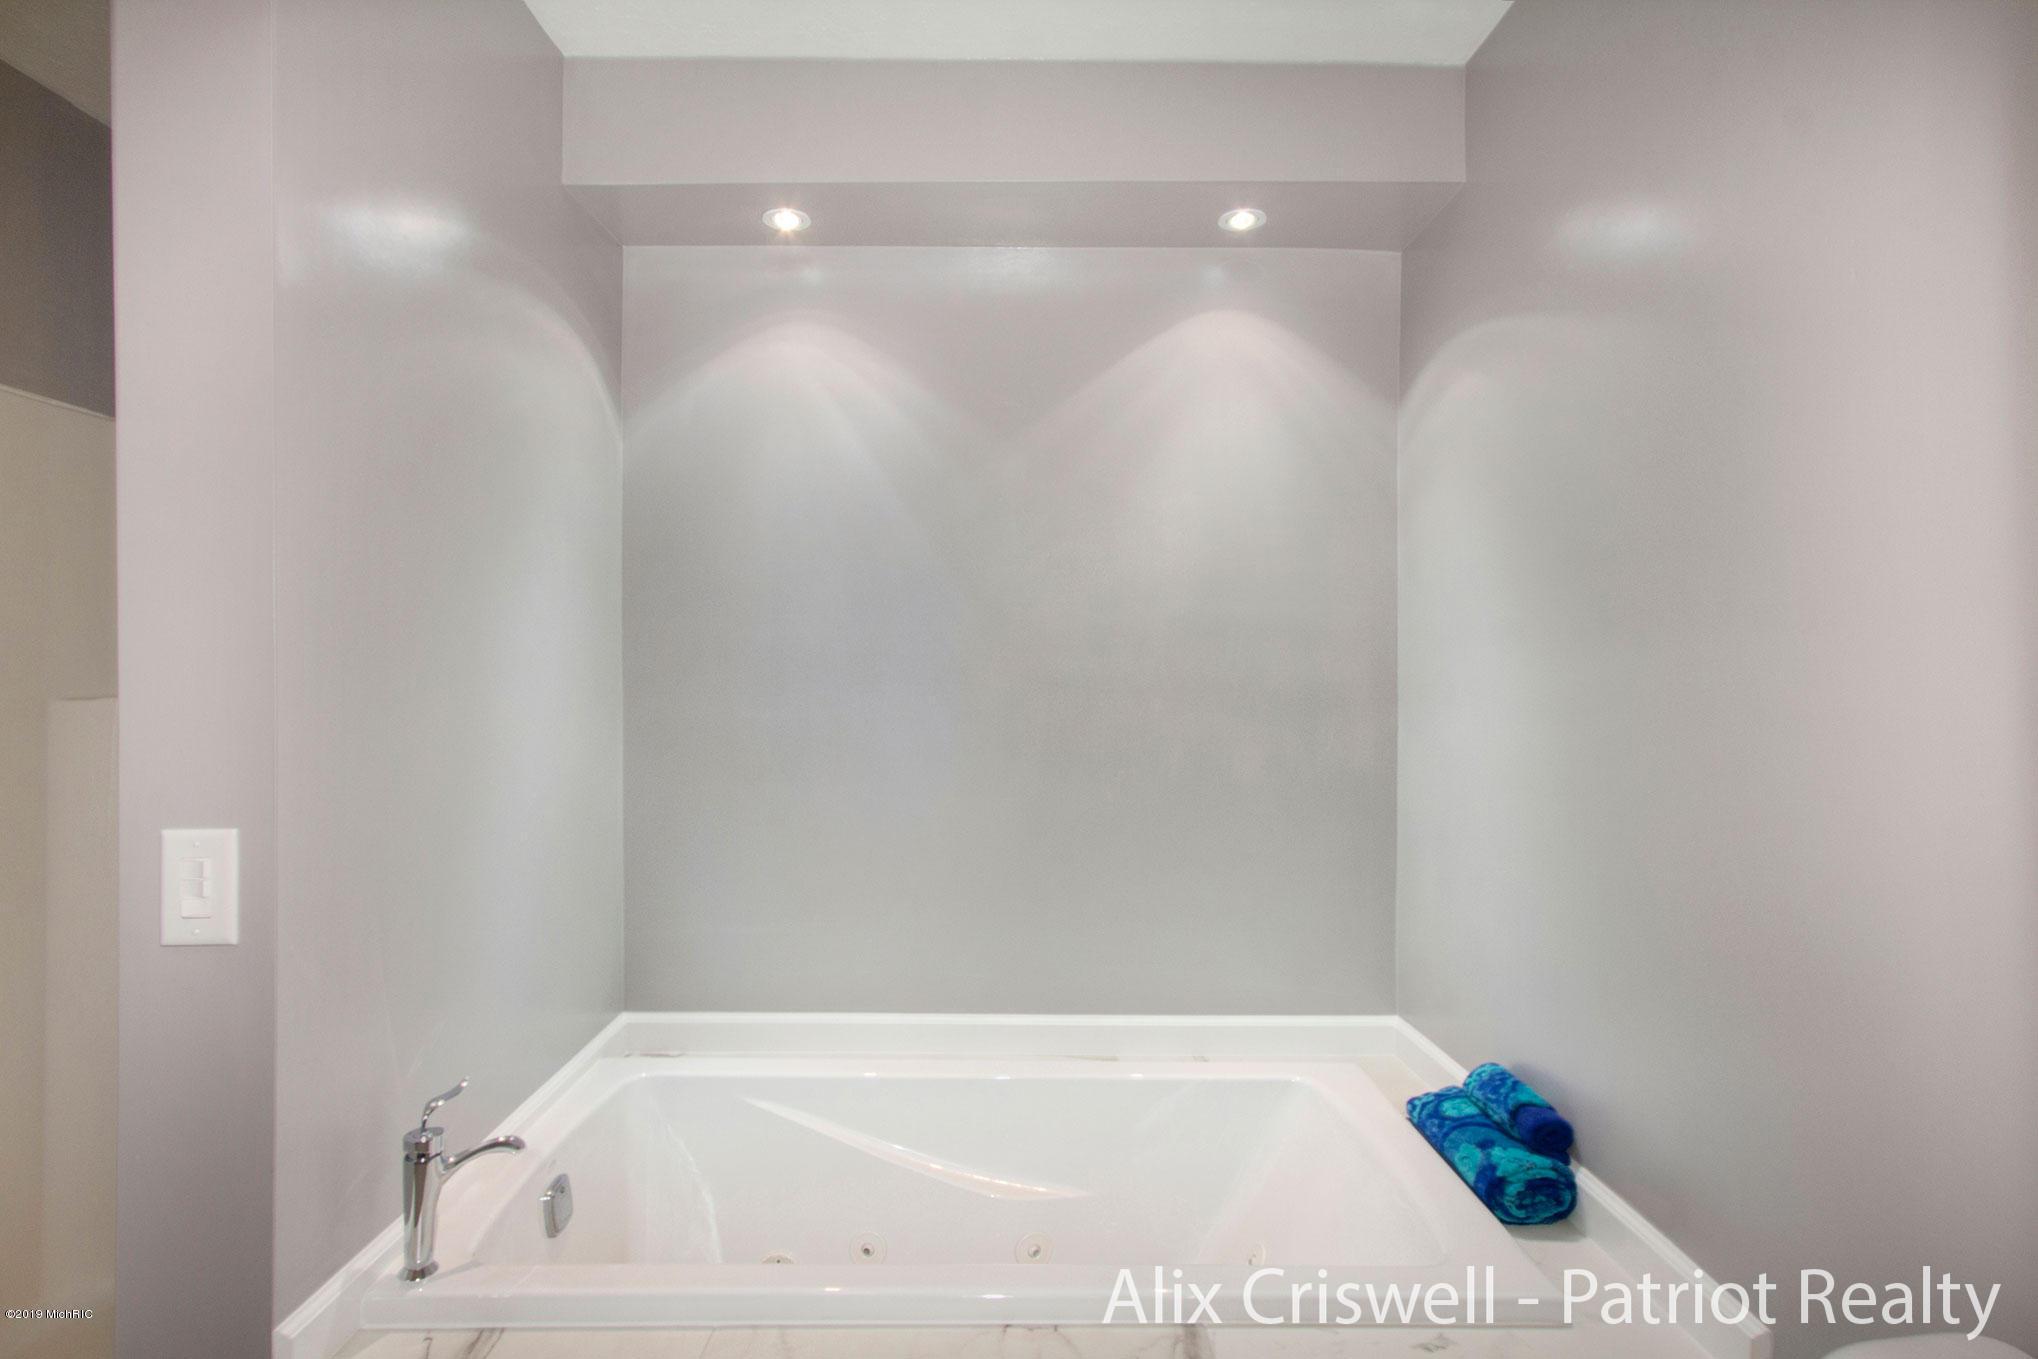 6079 126th Master Bathroom Whirlpool Tub